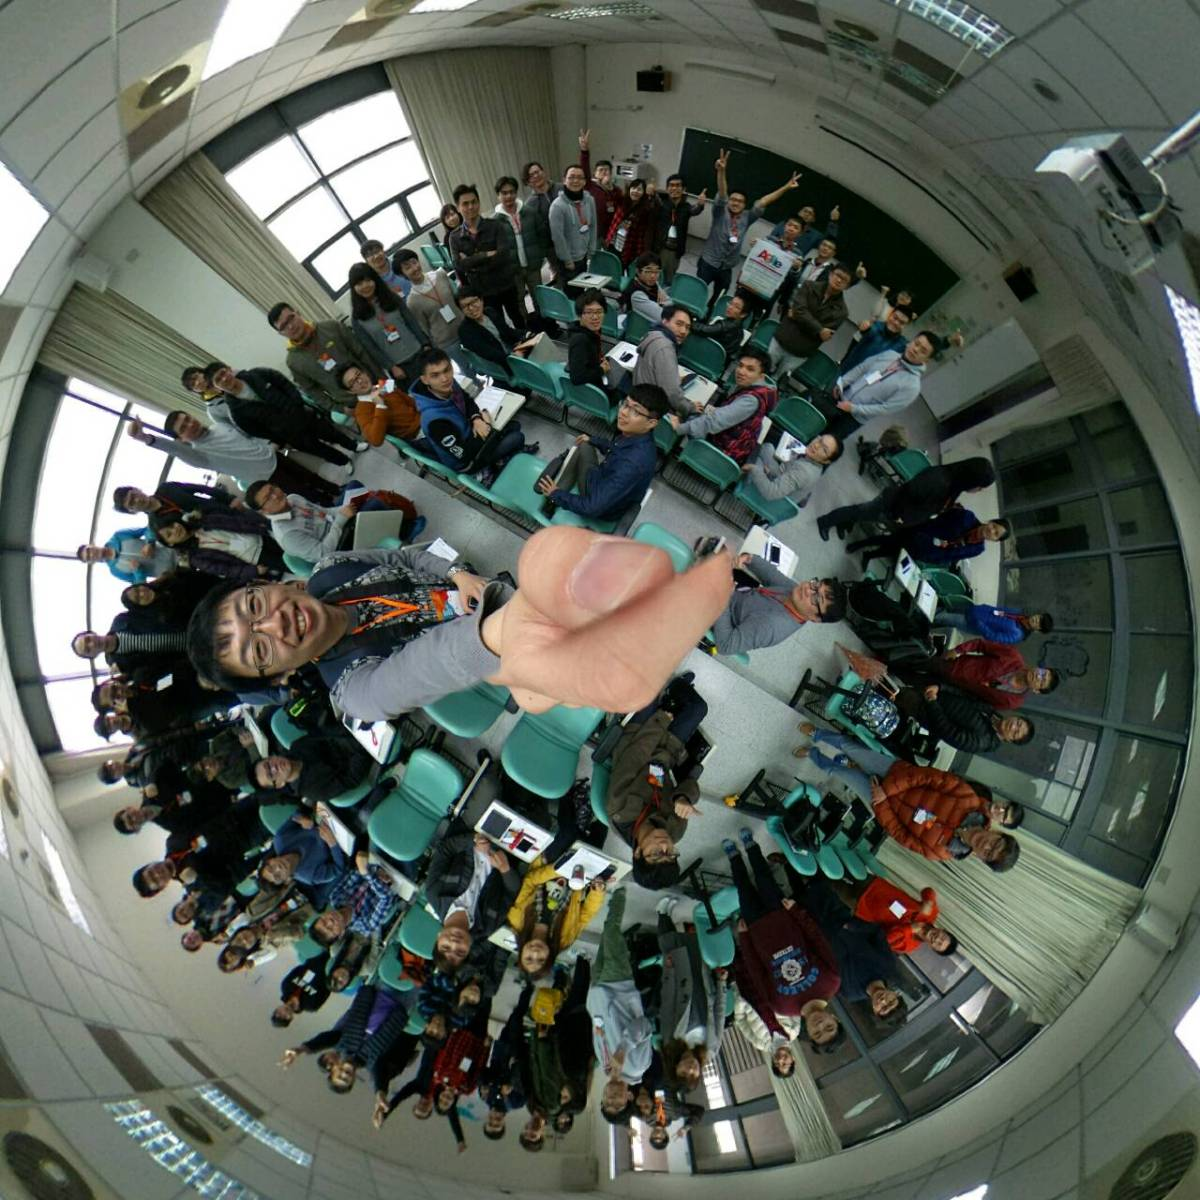 Agile Tour Taichung 2017『空手、緊握、到放手 – 敏捷路上學到的5件事』台中敏捷旅程分享心得